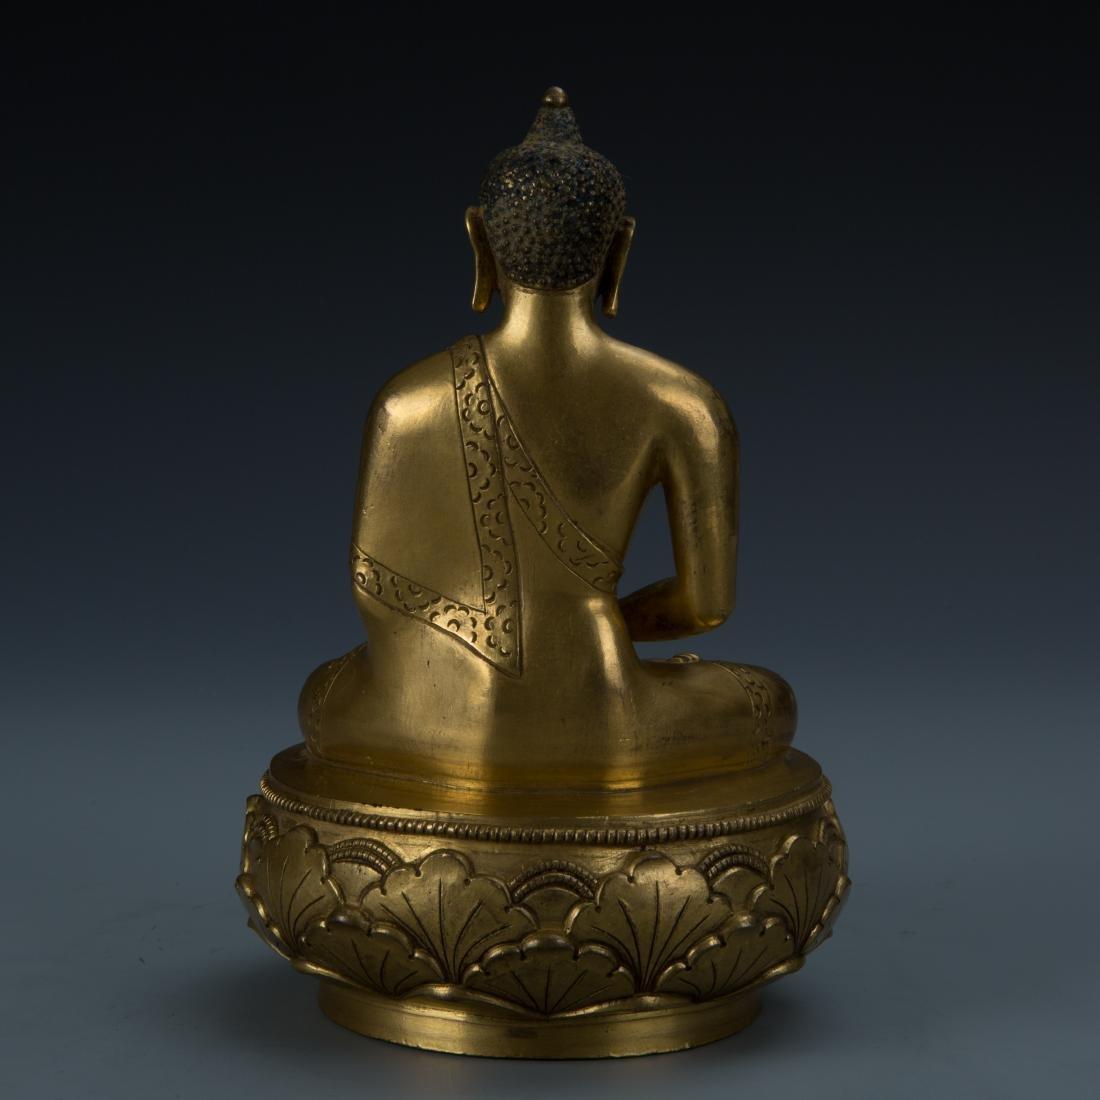 Rare Gilt Bronze Seated Buddha on a Rounded Lotus Base - 4